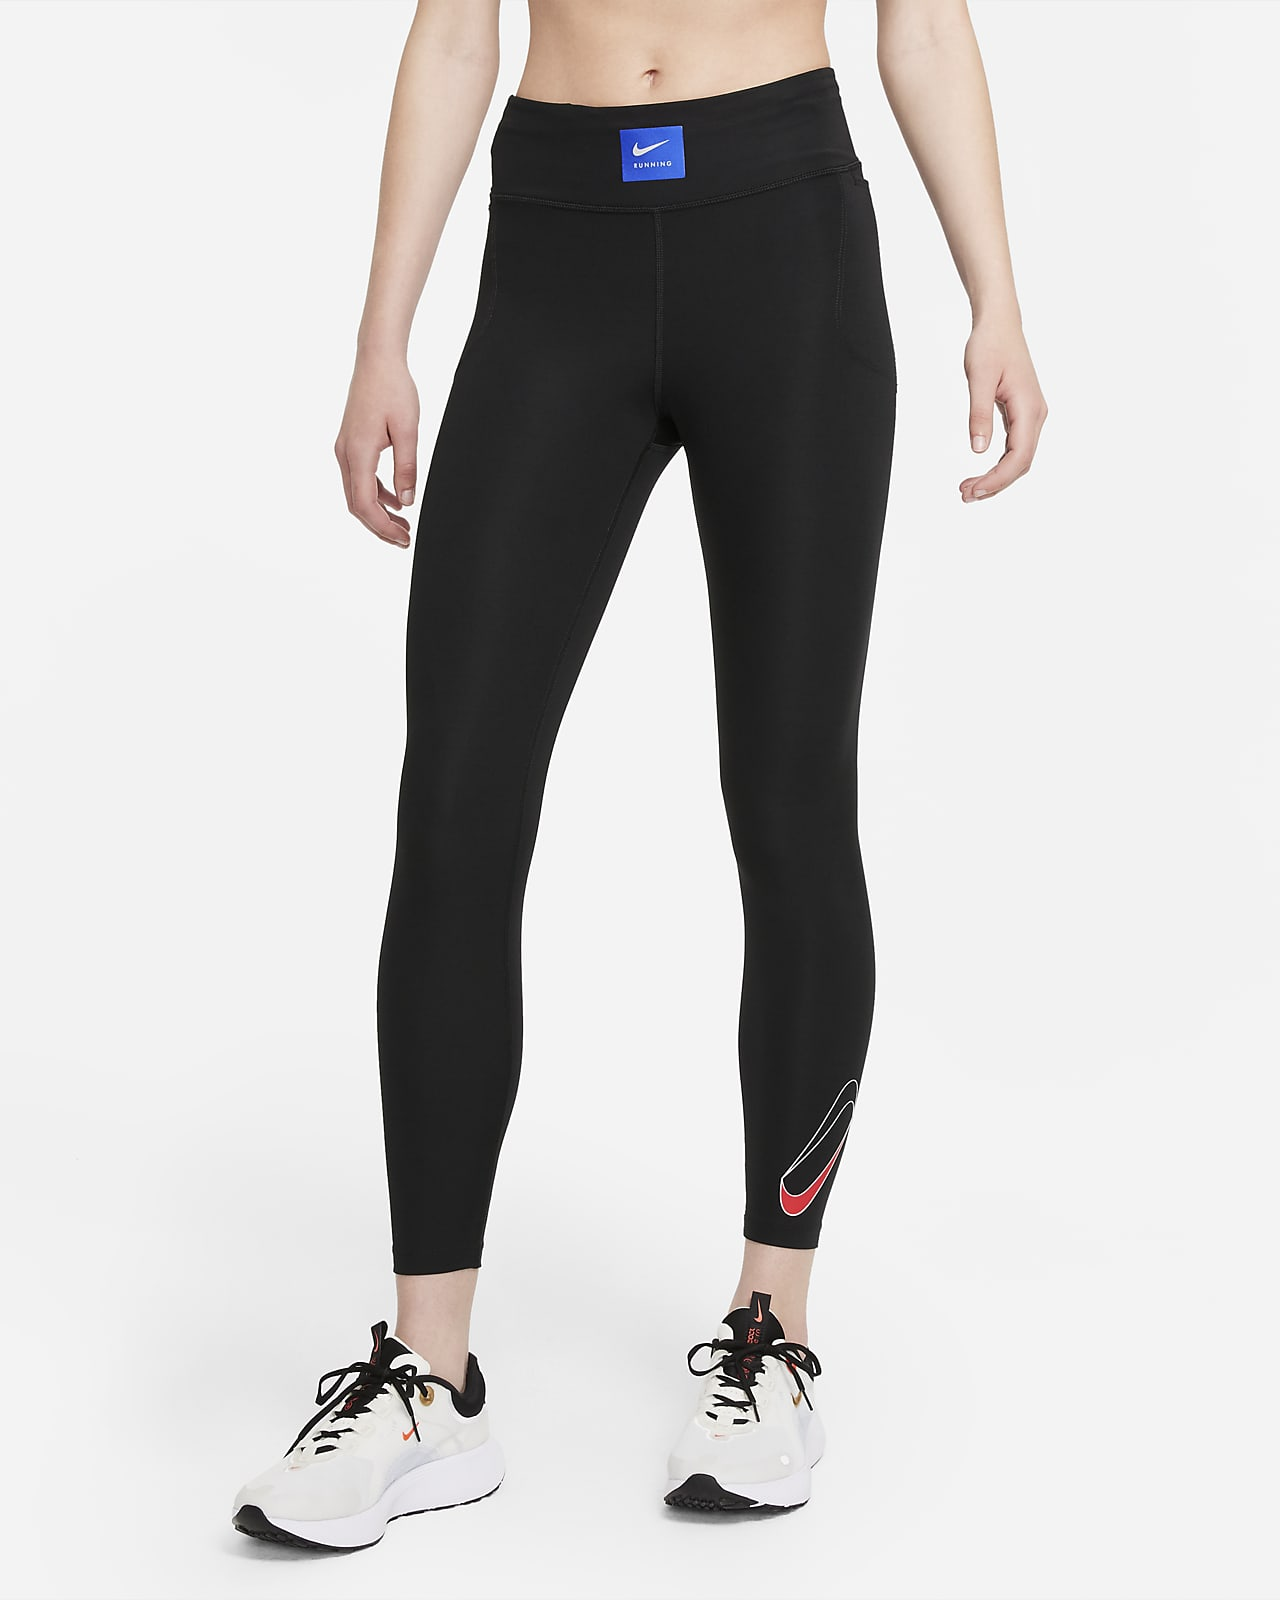 Leggings de running de 7/8 de tiro medio para mujer Nike Dri-FIT Retro Run Faster